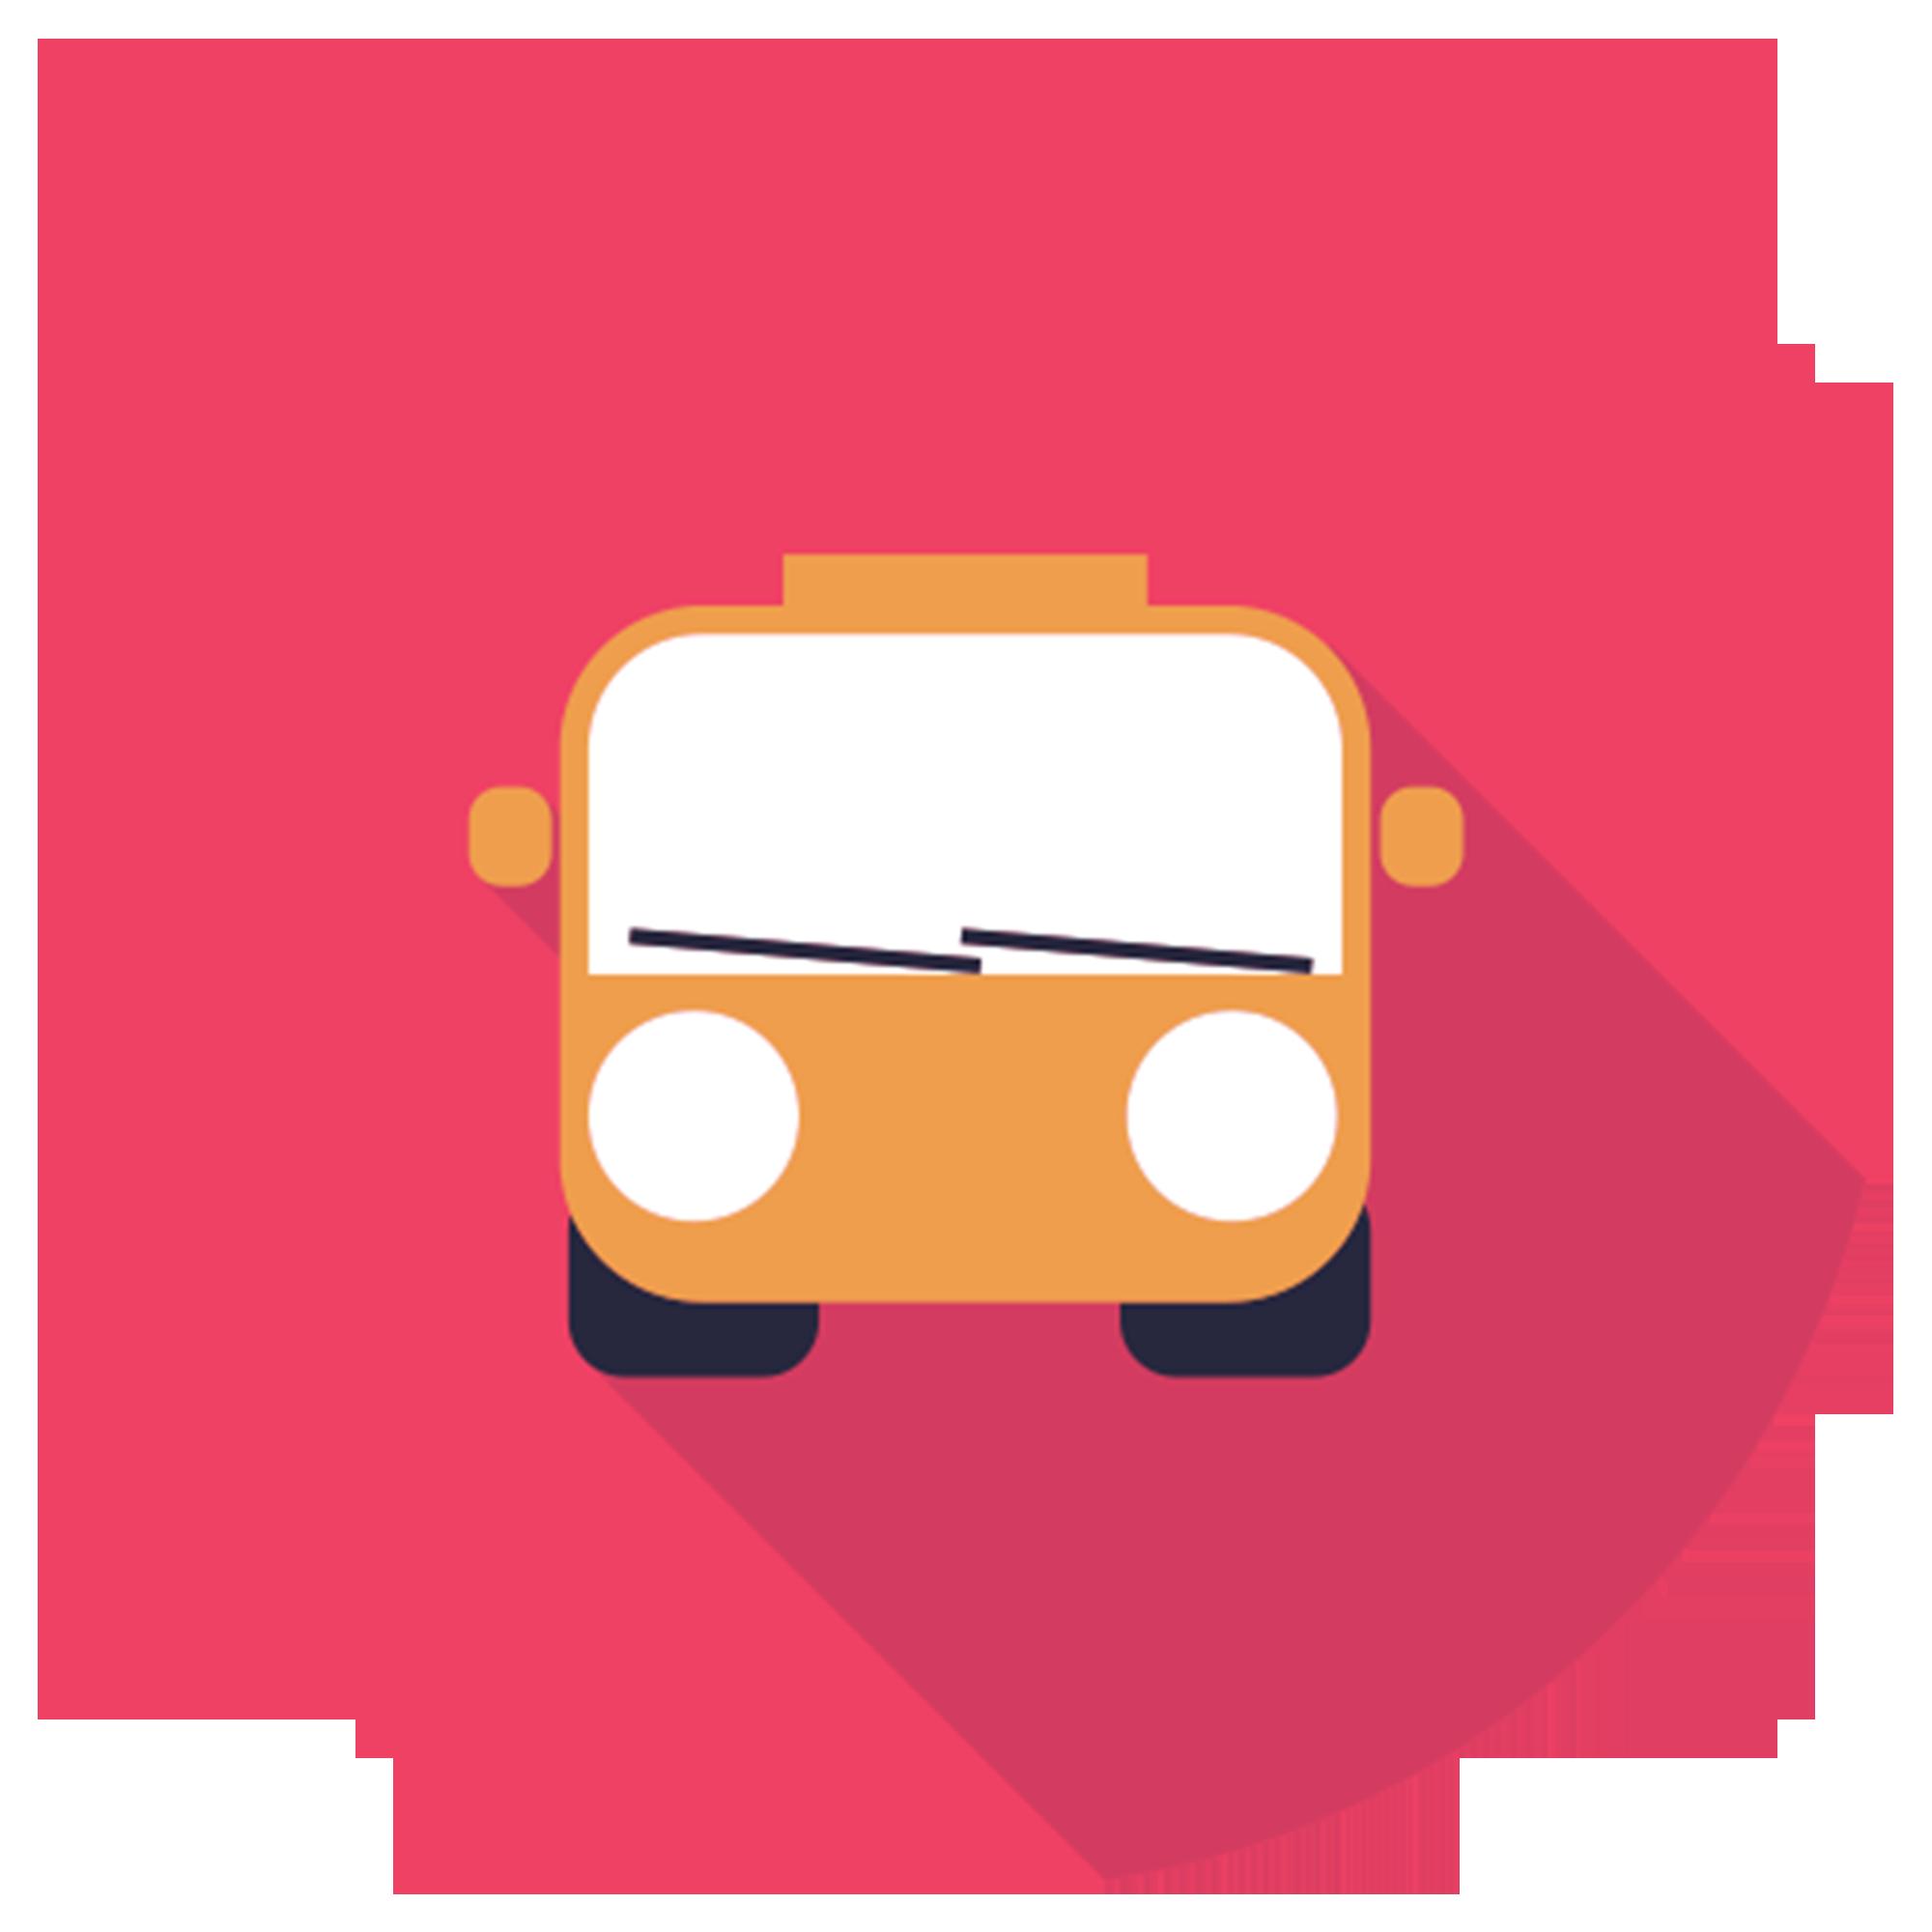 School child transprent png. Clipart bus airport bus